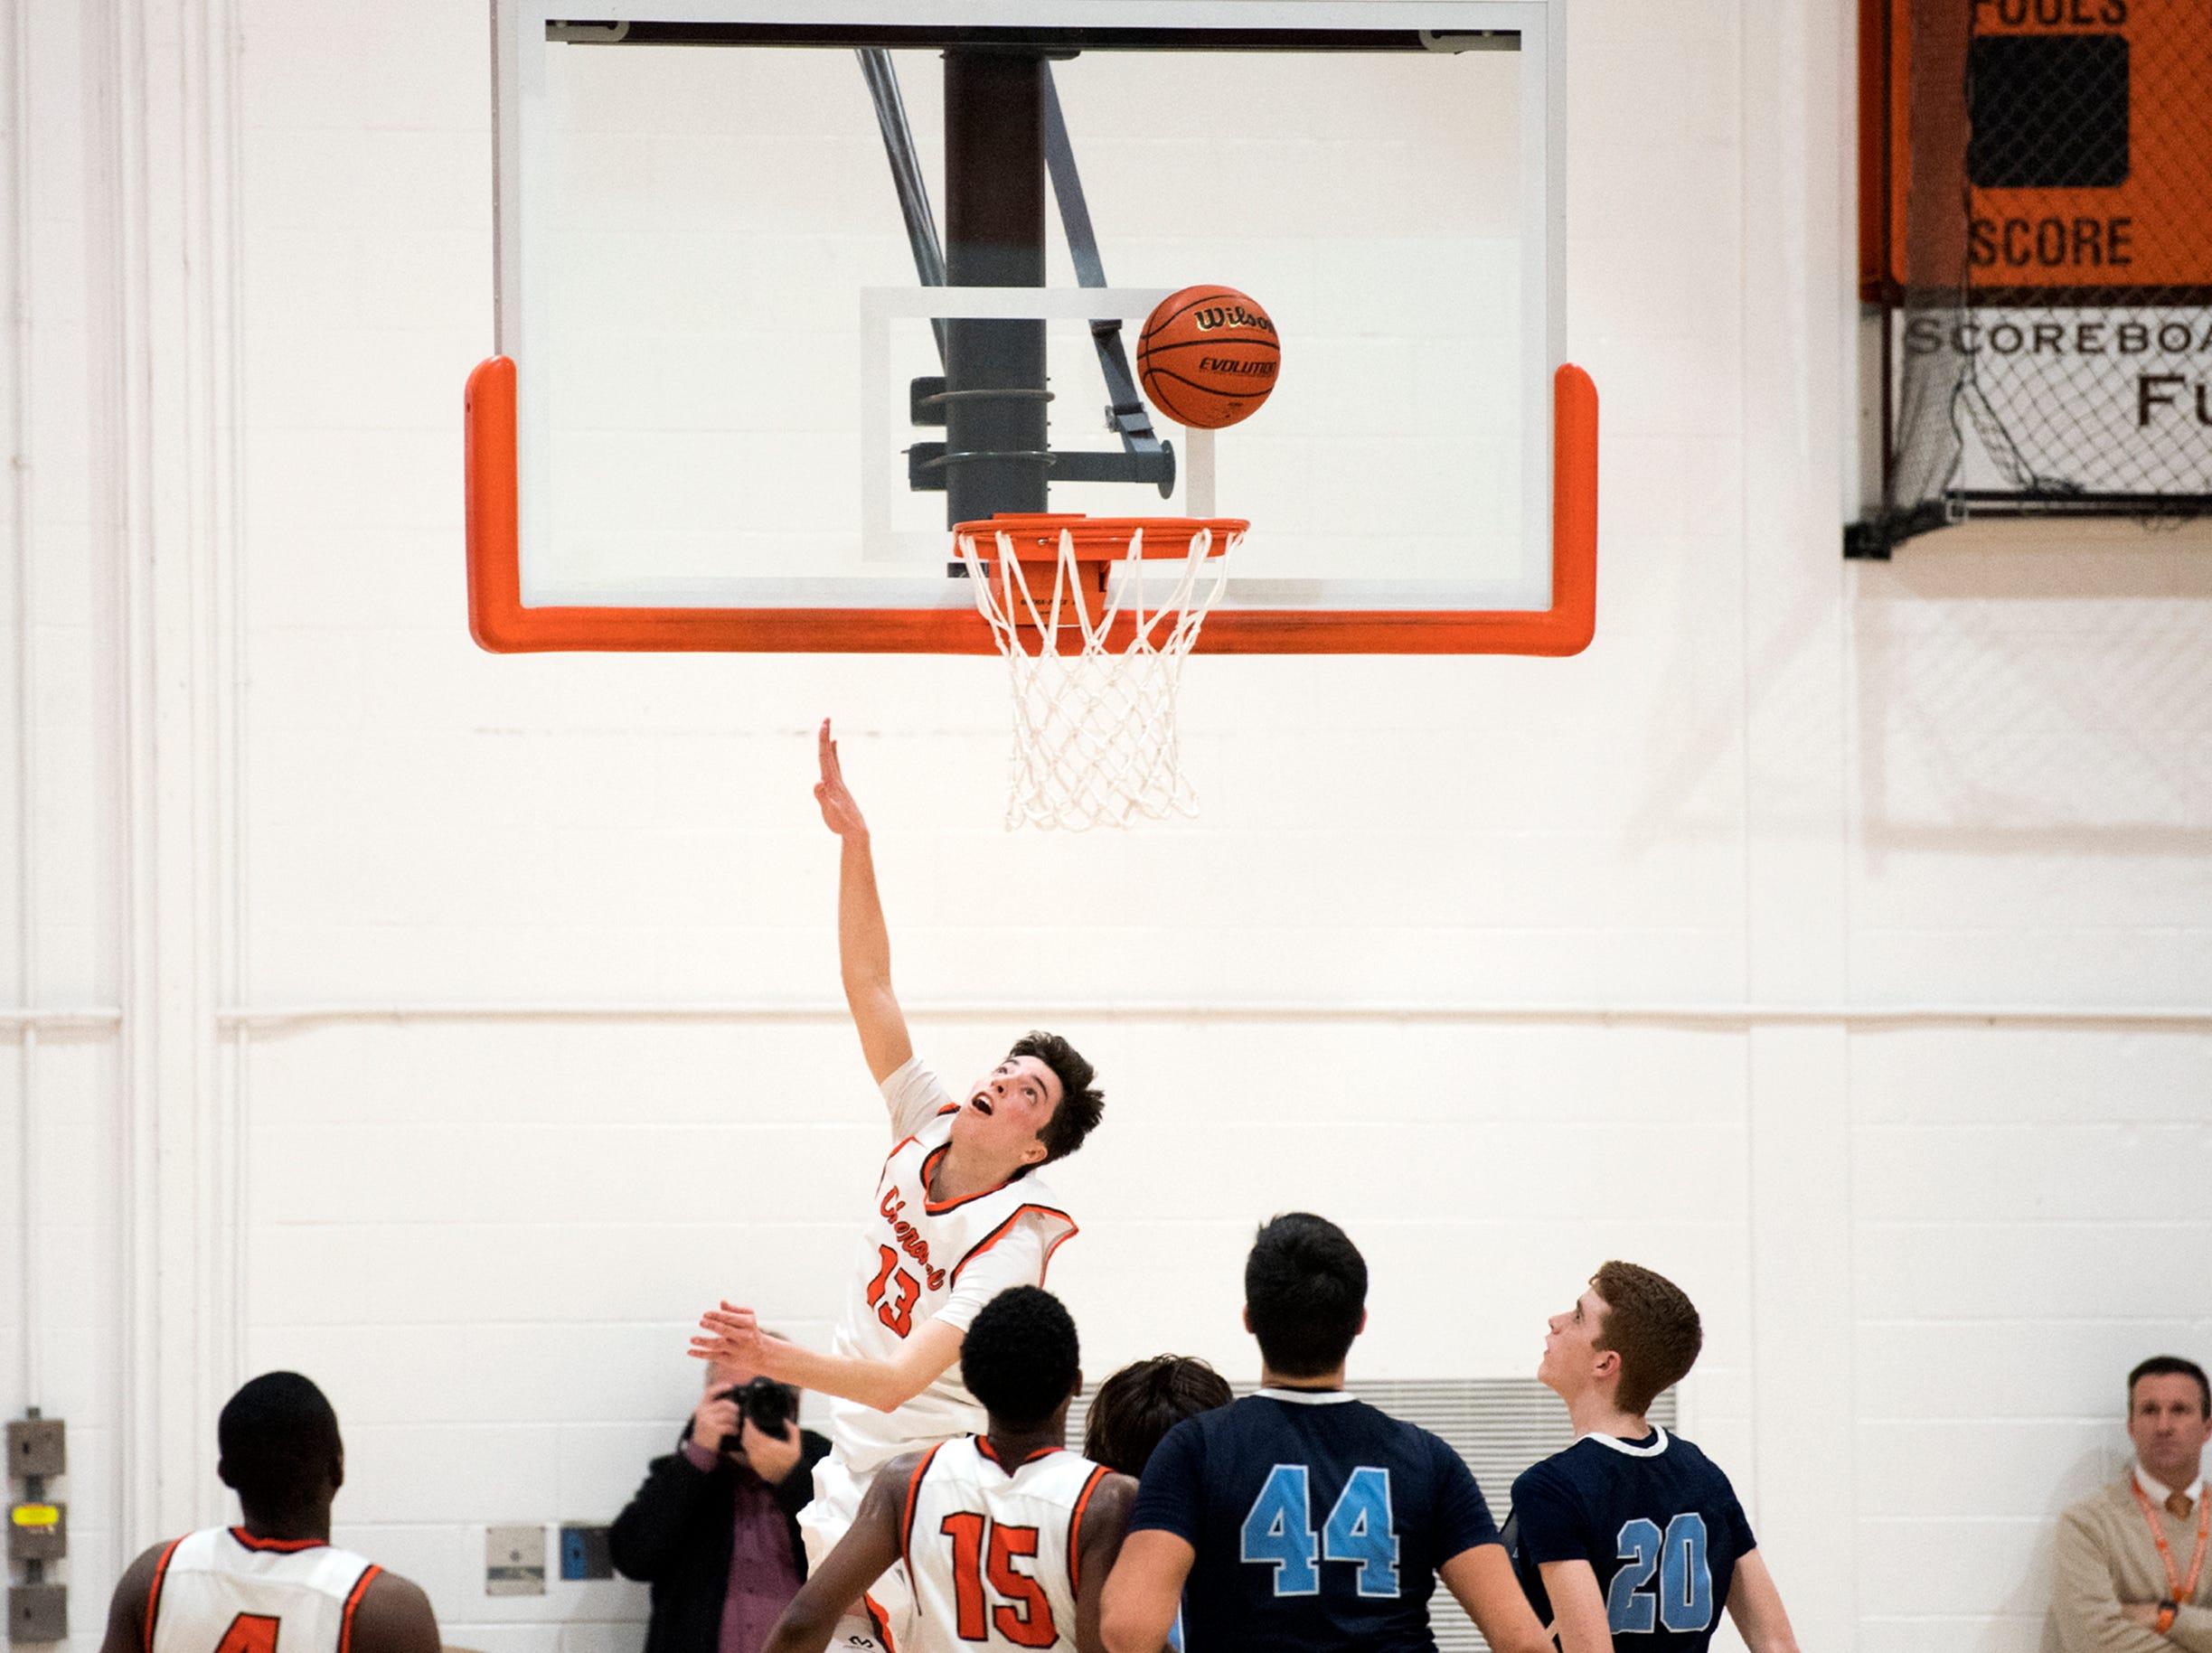 Cherokee's Anthony DiCaro (13) attempts a basket against Shawnee Monday, Feb. 25, 2019 at Cherokee High School in Marlton, N.J. Cherokee won 54-38.